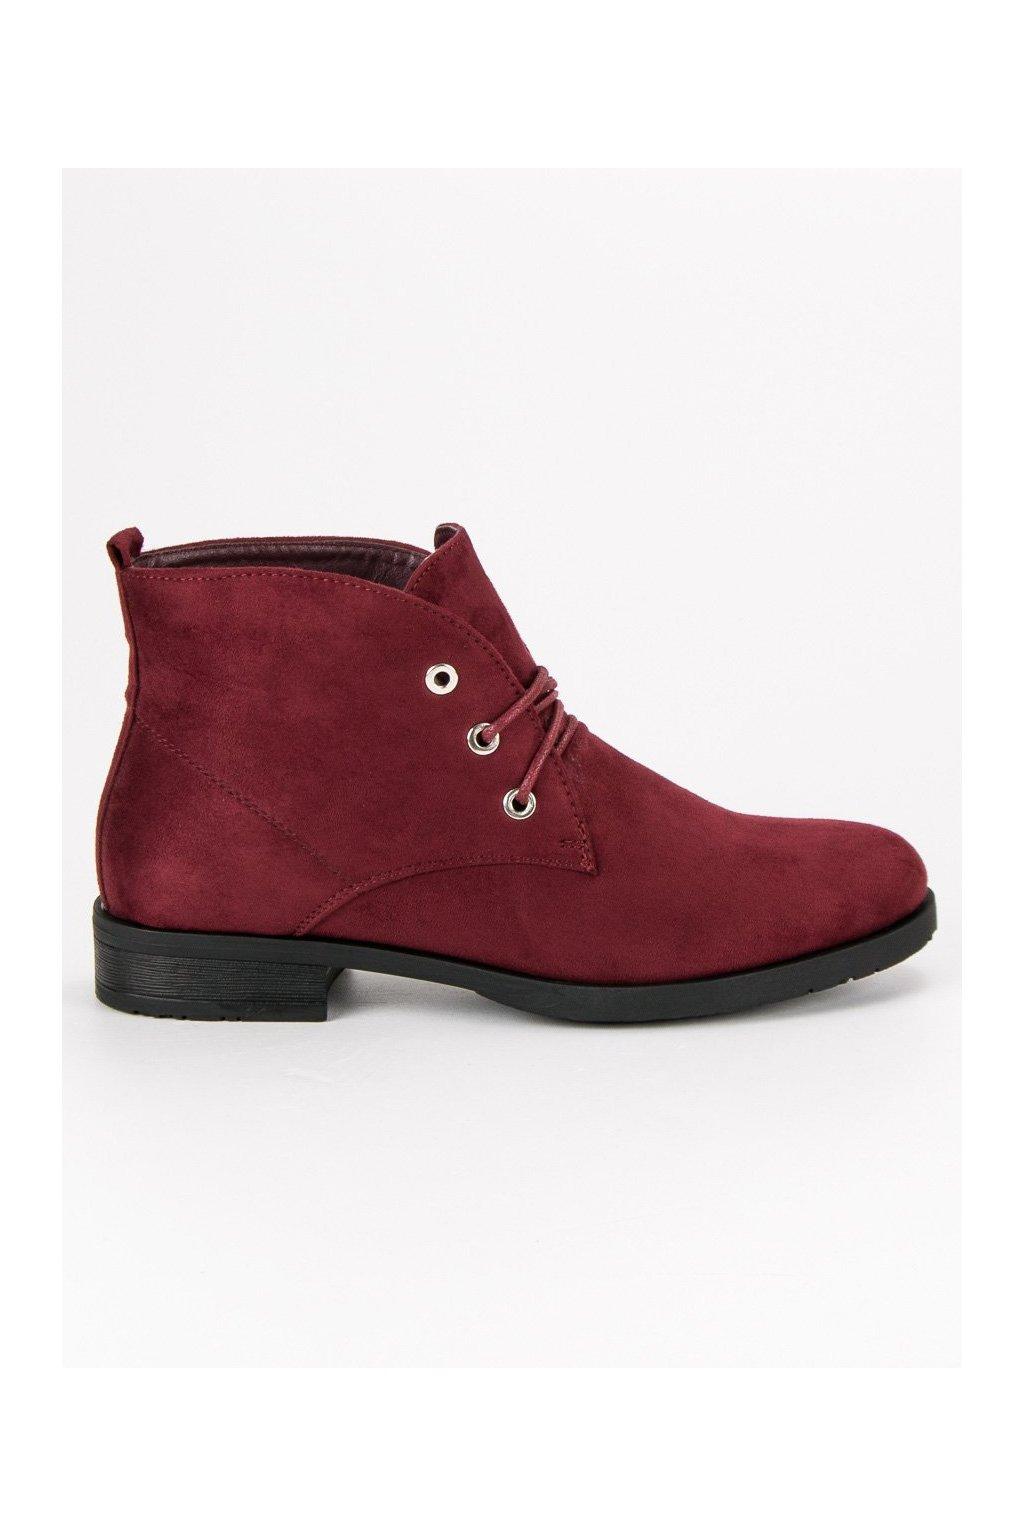 665c464a83f2 1037167-1 nizke-semisove-topanky -cervene-clenkove-cizmy-sweet-shoes.jpg 5bc11c37